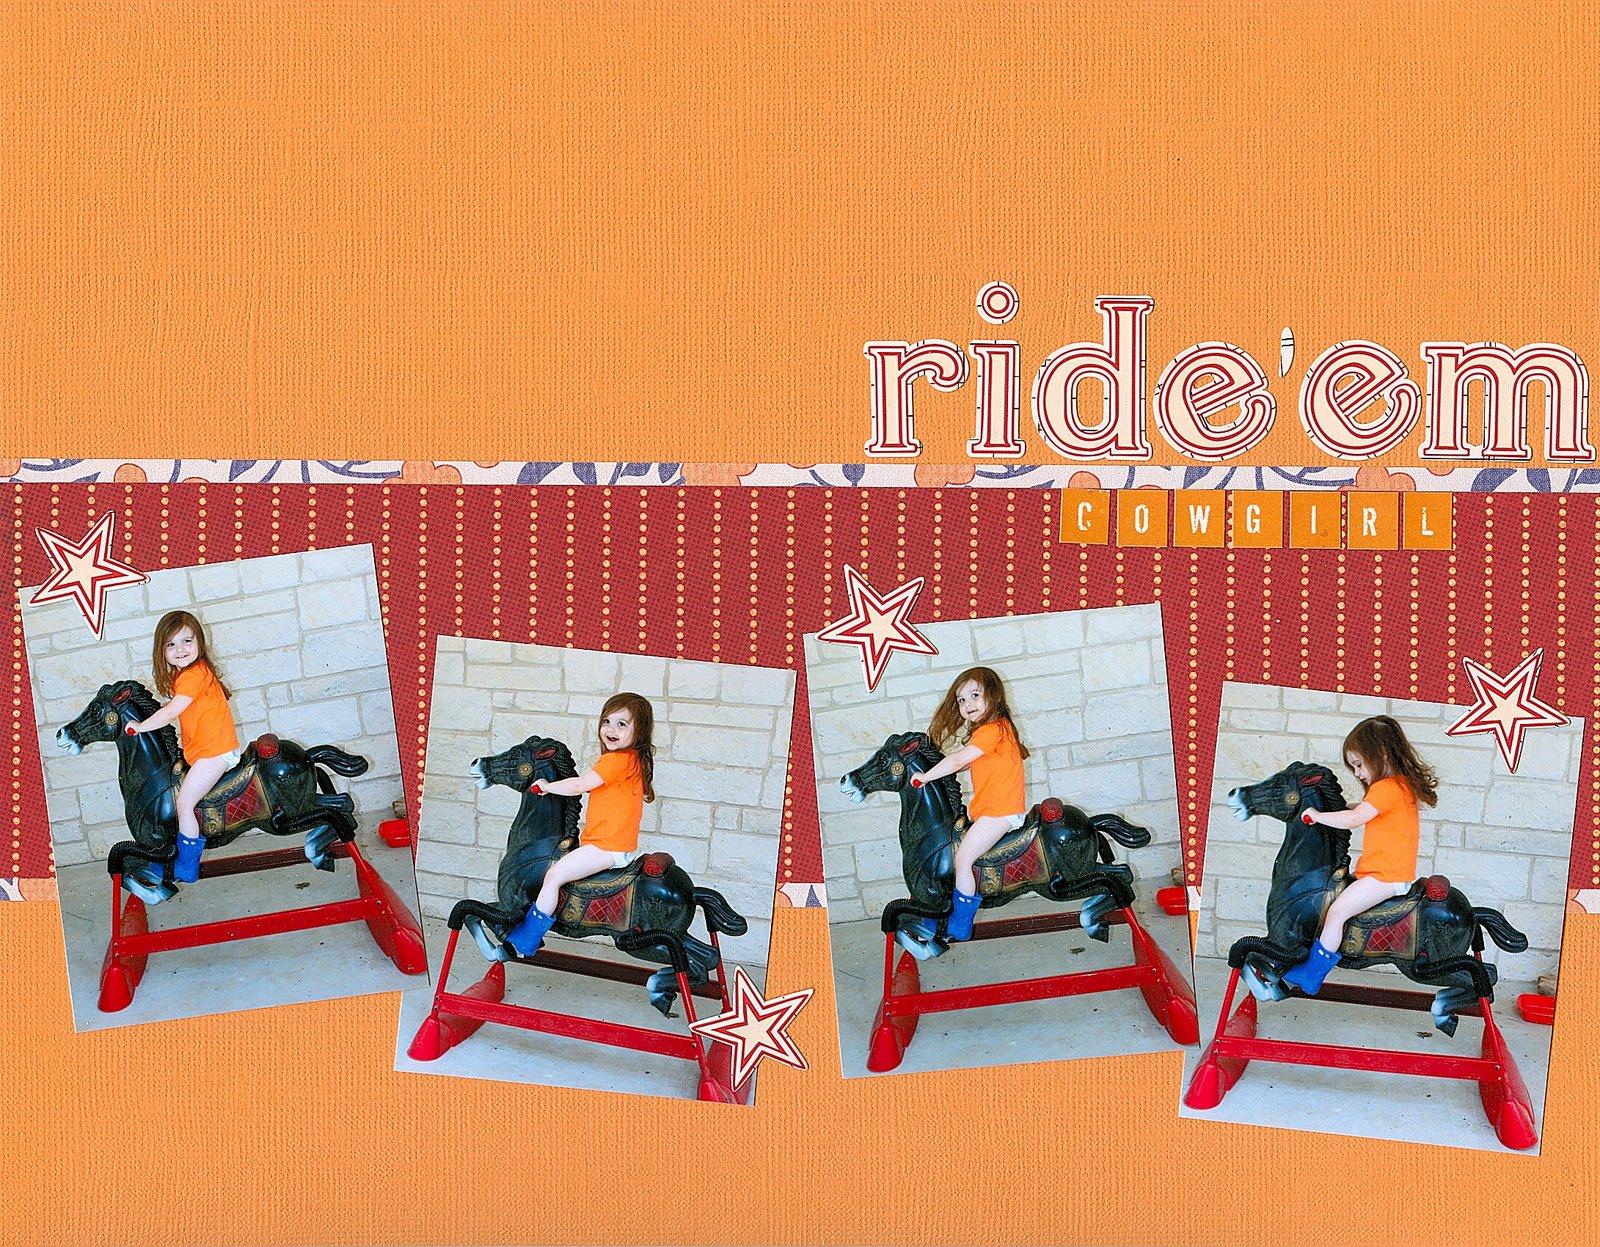 [ride]